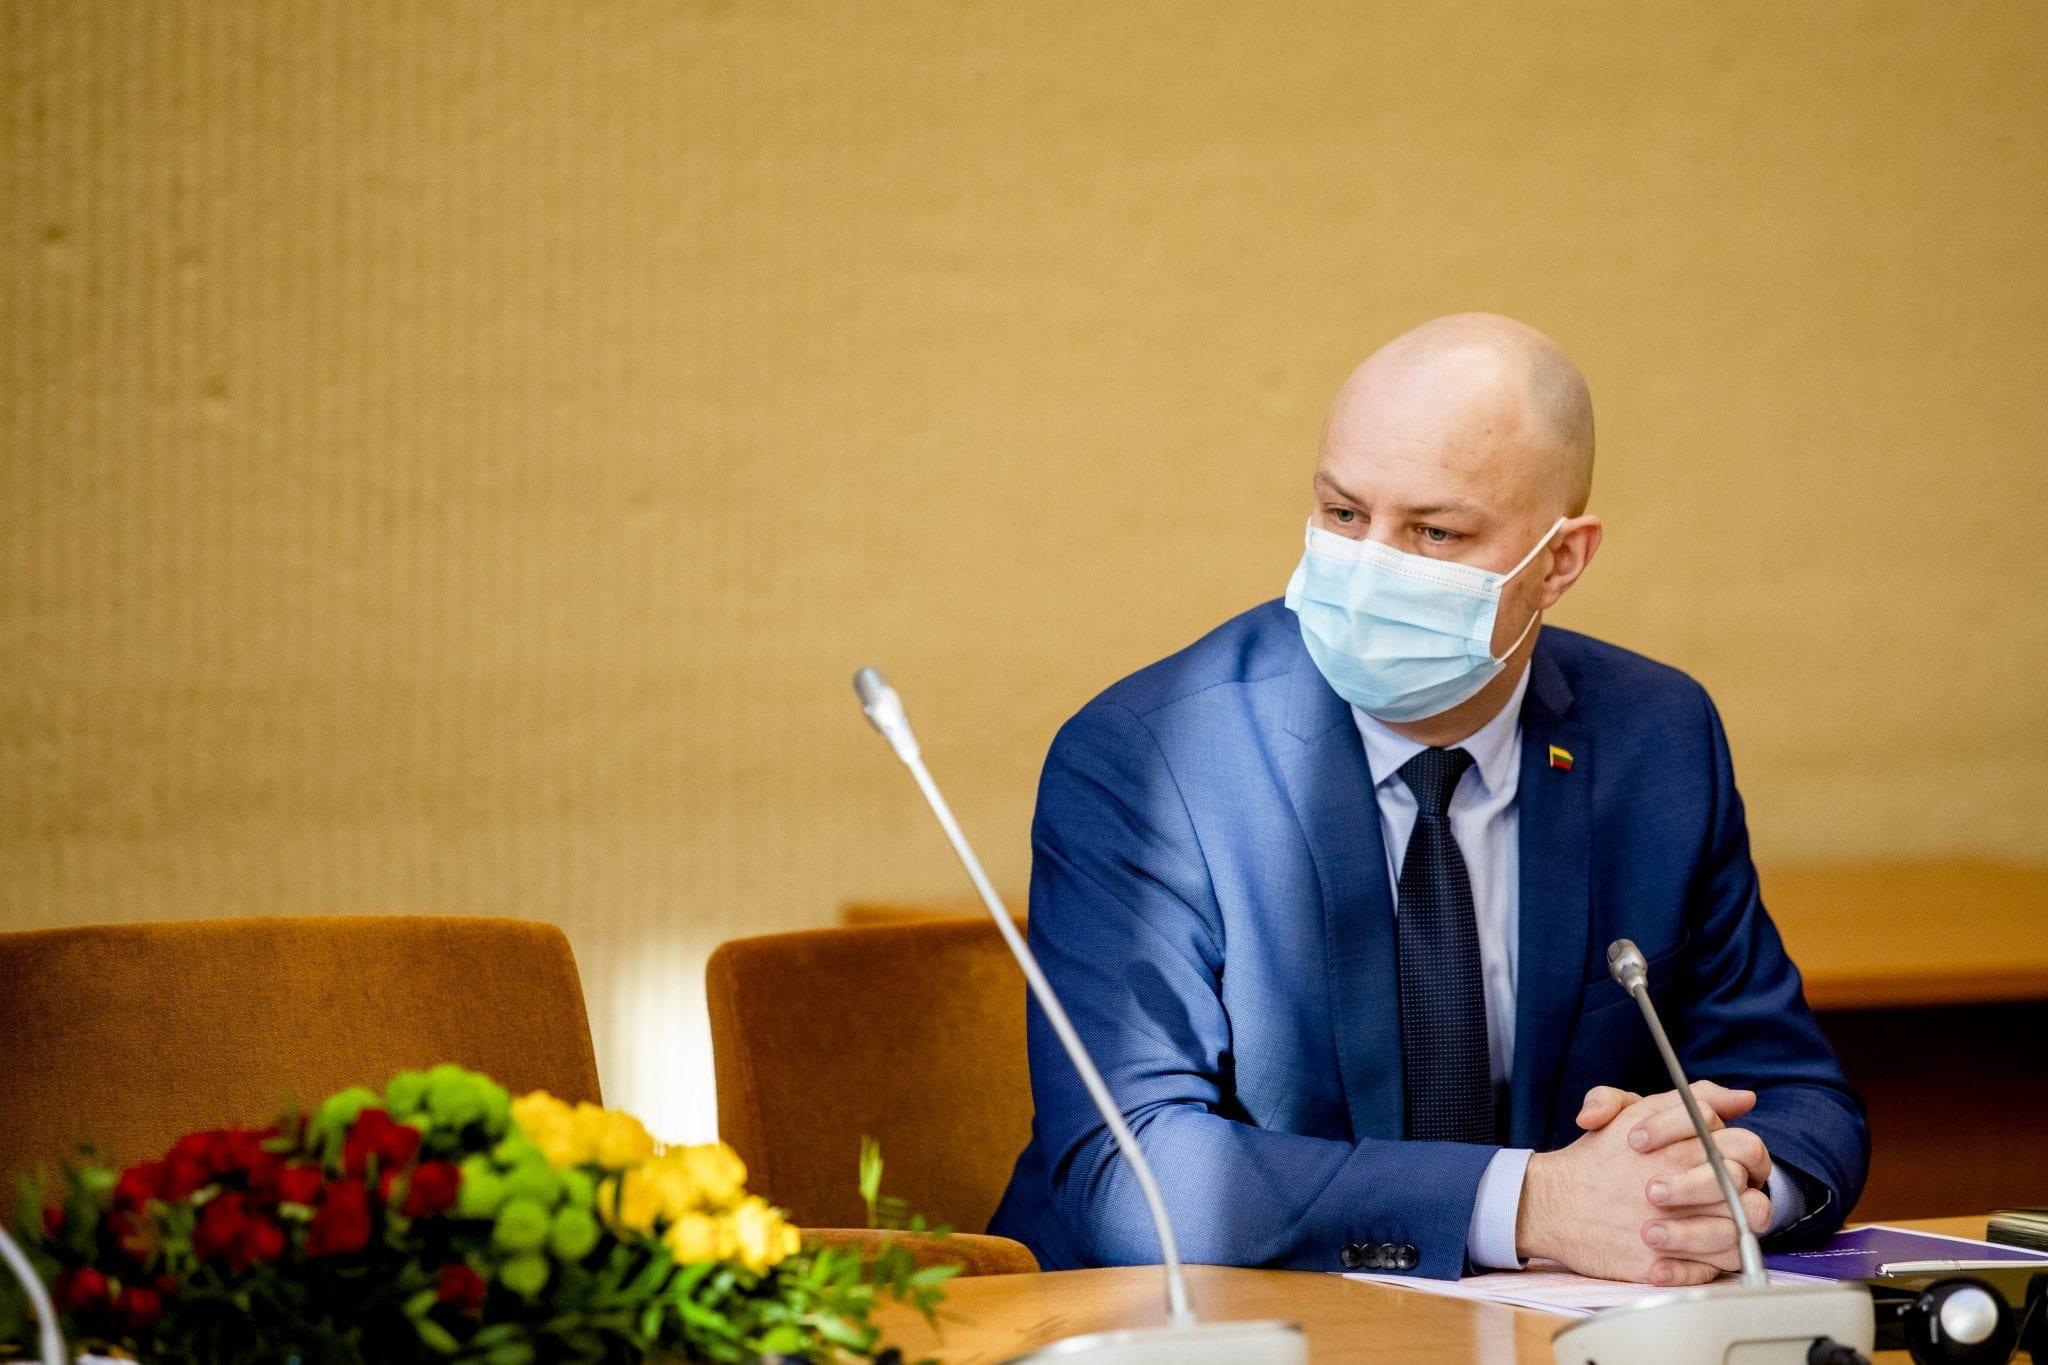 Buvęs sveikatos apsaugos ministras Aurelijus Veryga